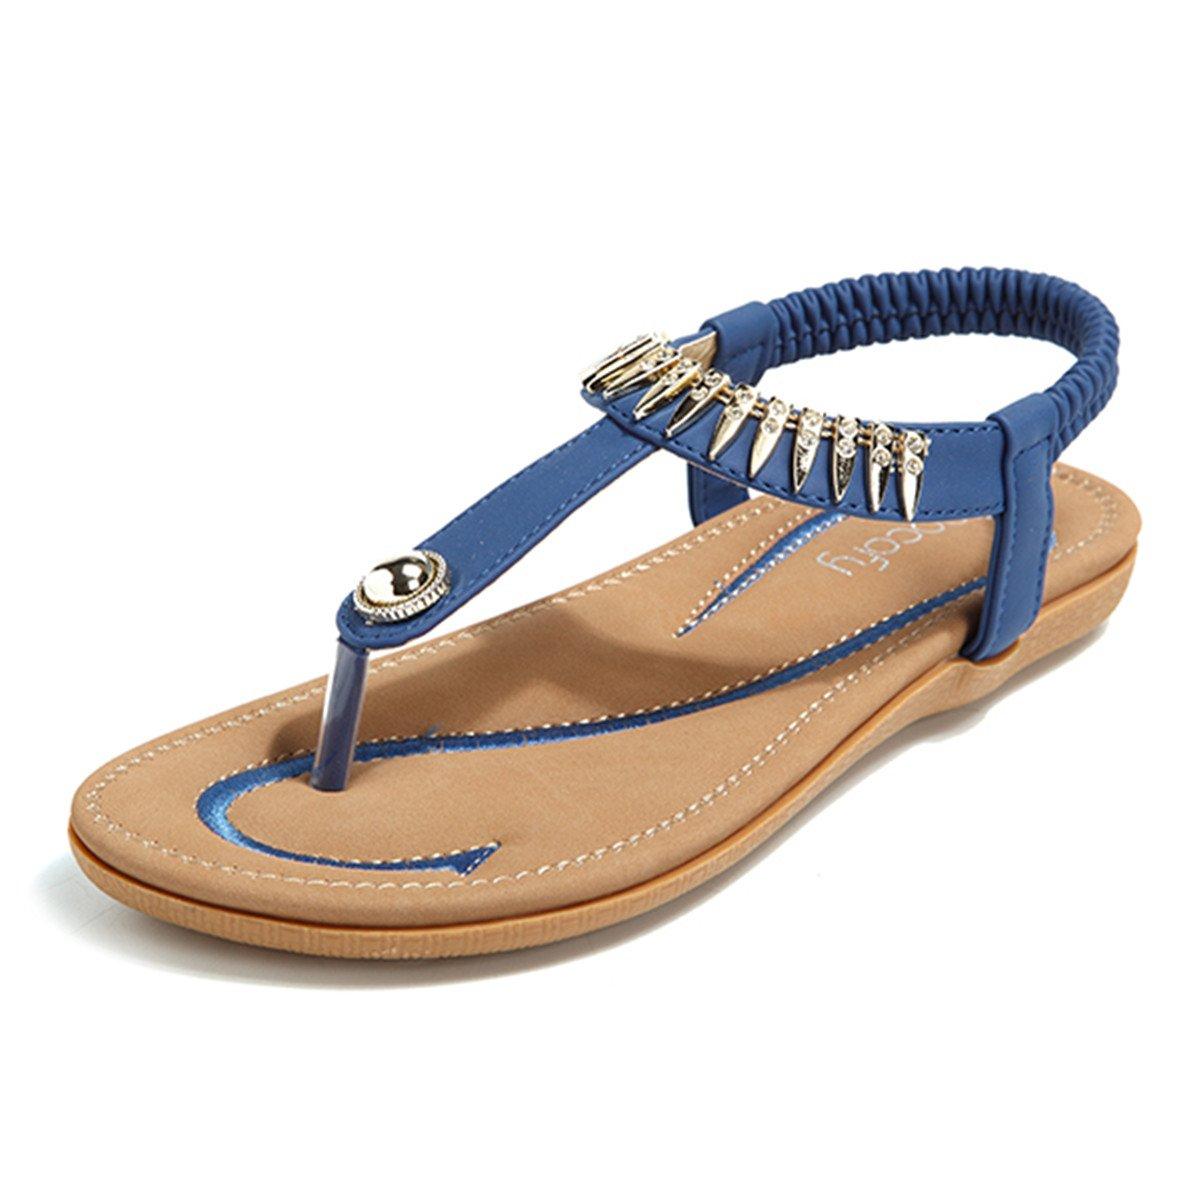 Socofy Bohemian Sandals,Women's Metal Elastic Flat Sandals Summer Bohemia Style Clip Toe Flip Flops Shoes Blue 9 B(M) US